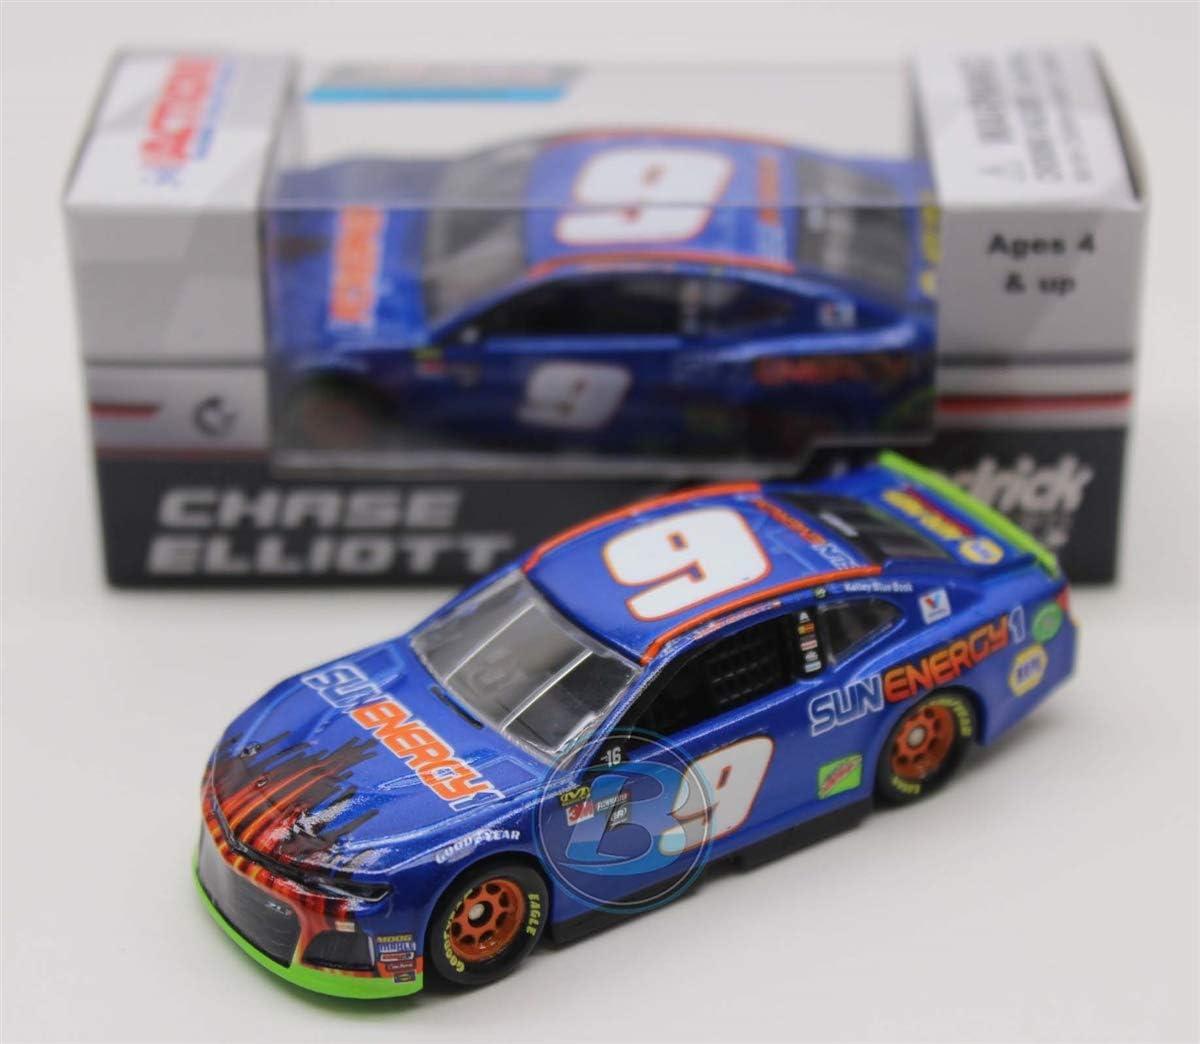 Lionel Racing Chase Elliott 2018 NAPA Patriotic NASCAR Diecast 1:64 Scale